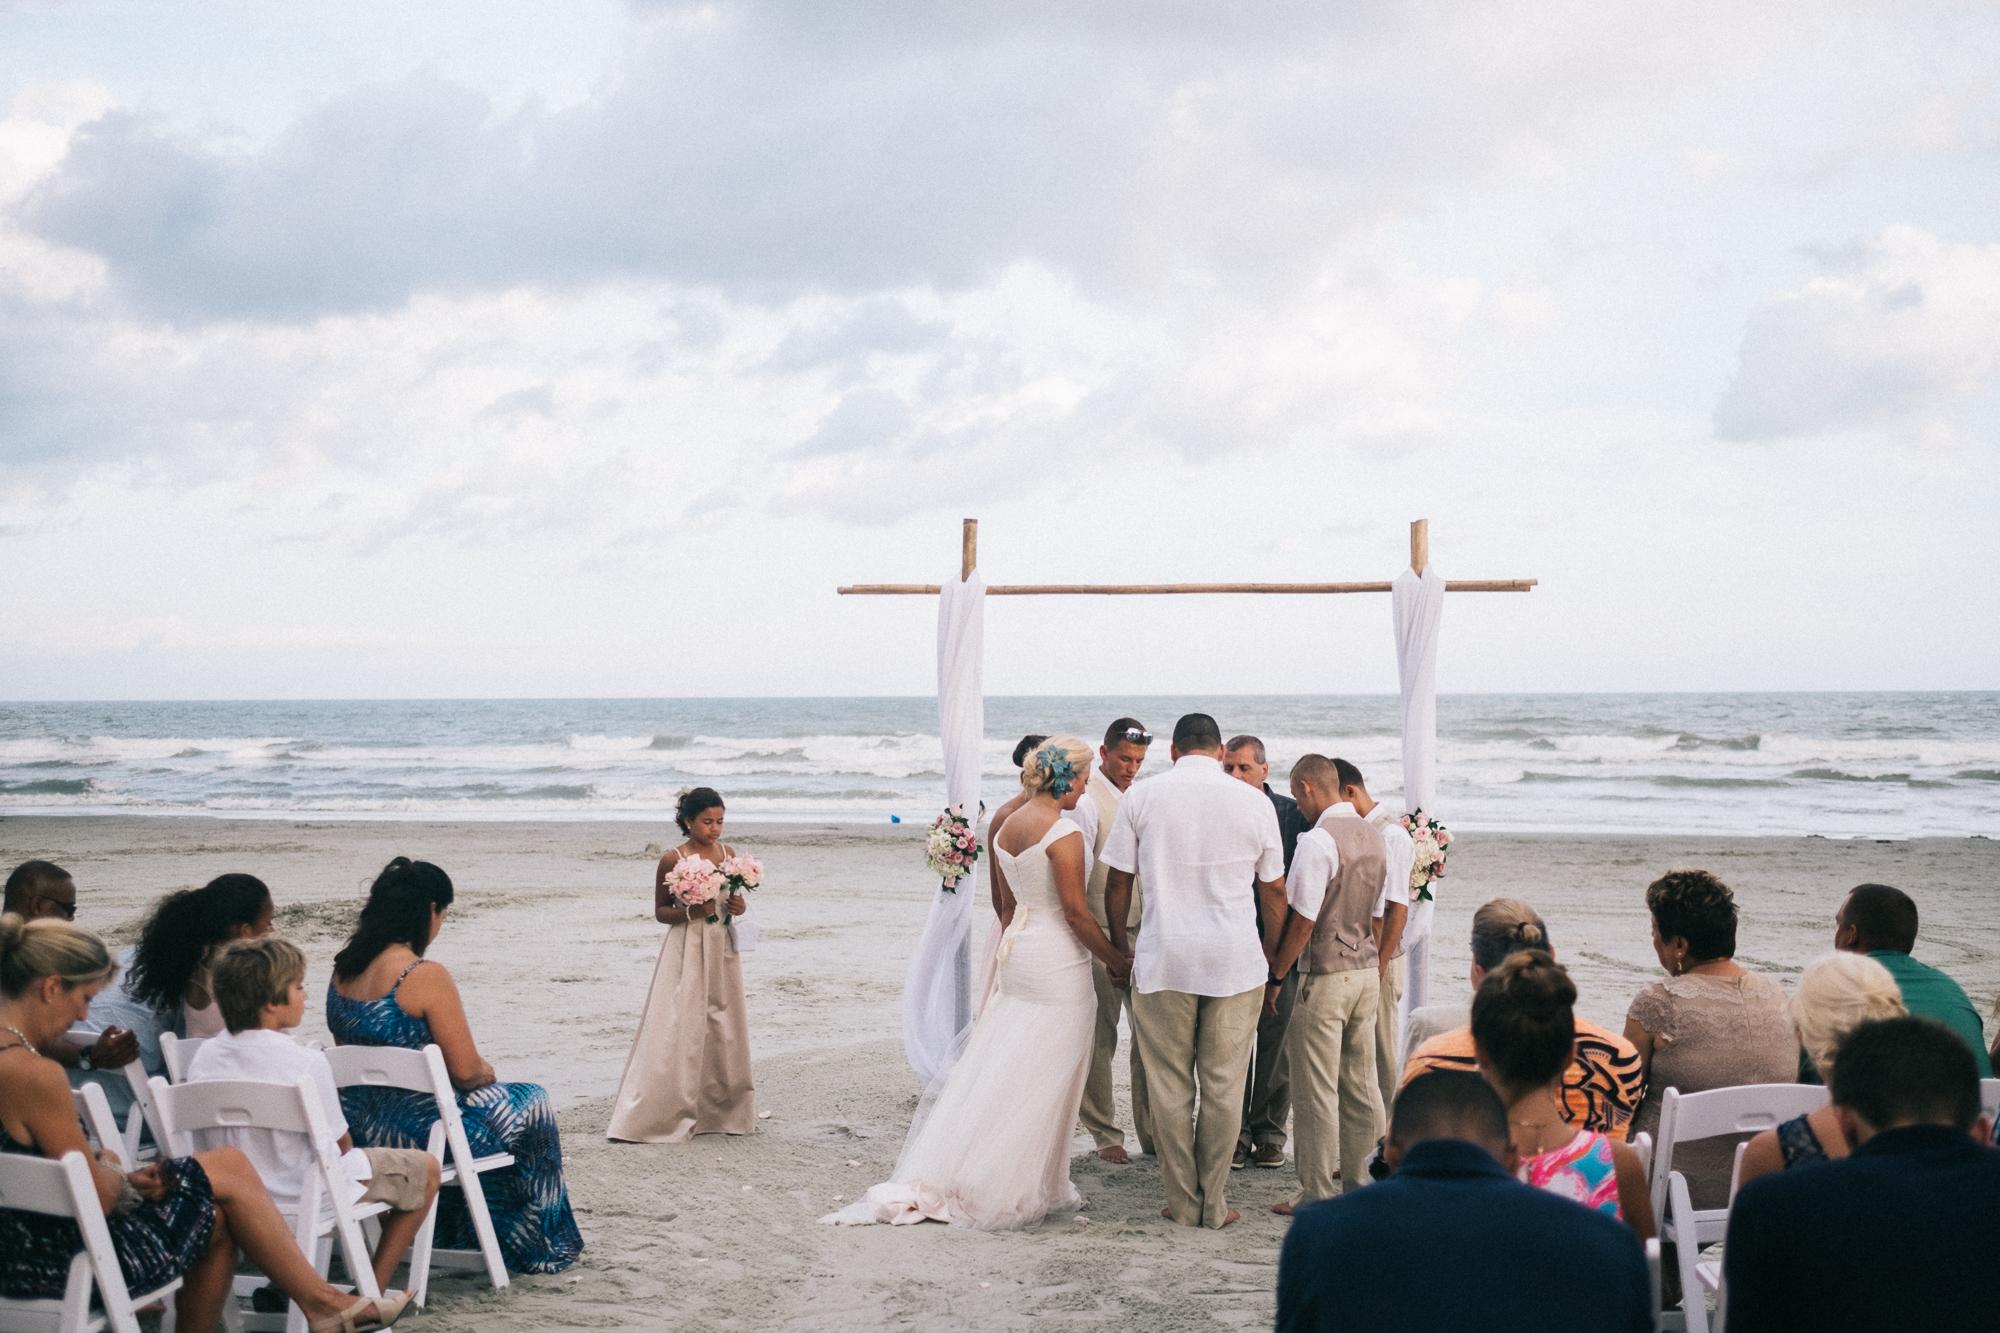 Stephanie-Mike-wedding-blog-16.jpg